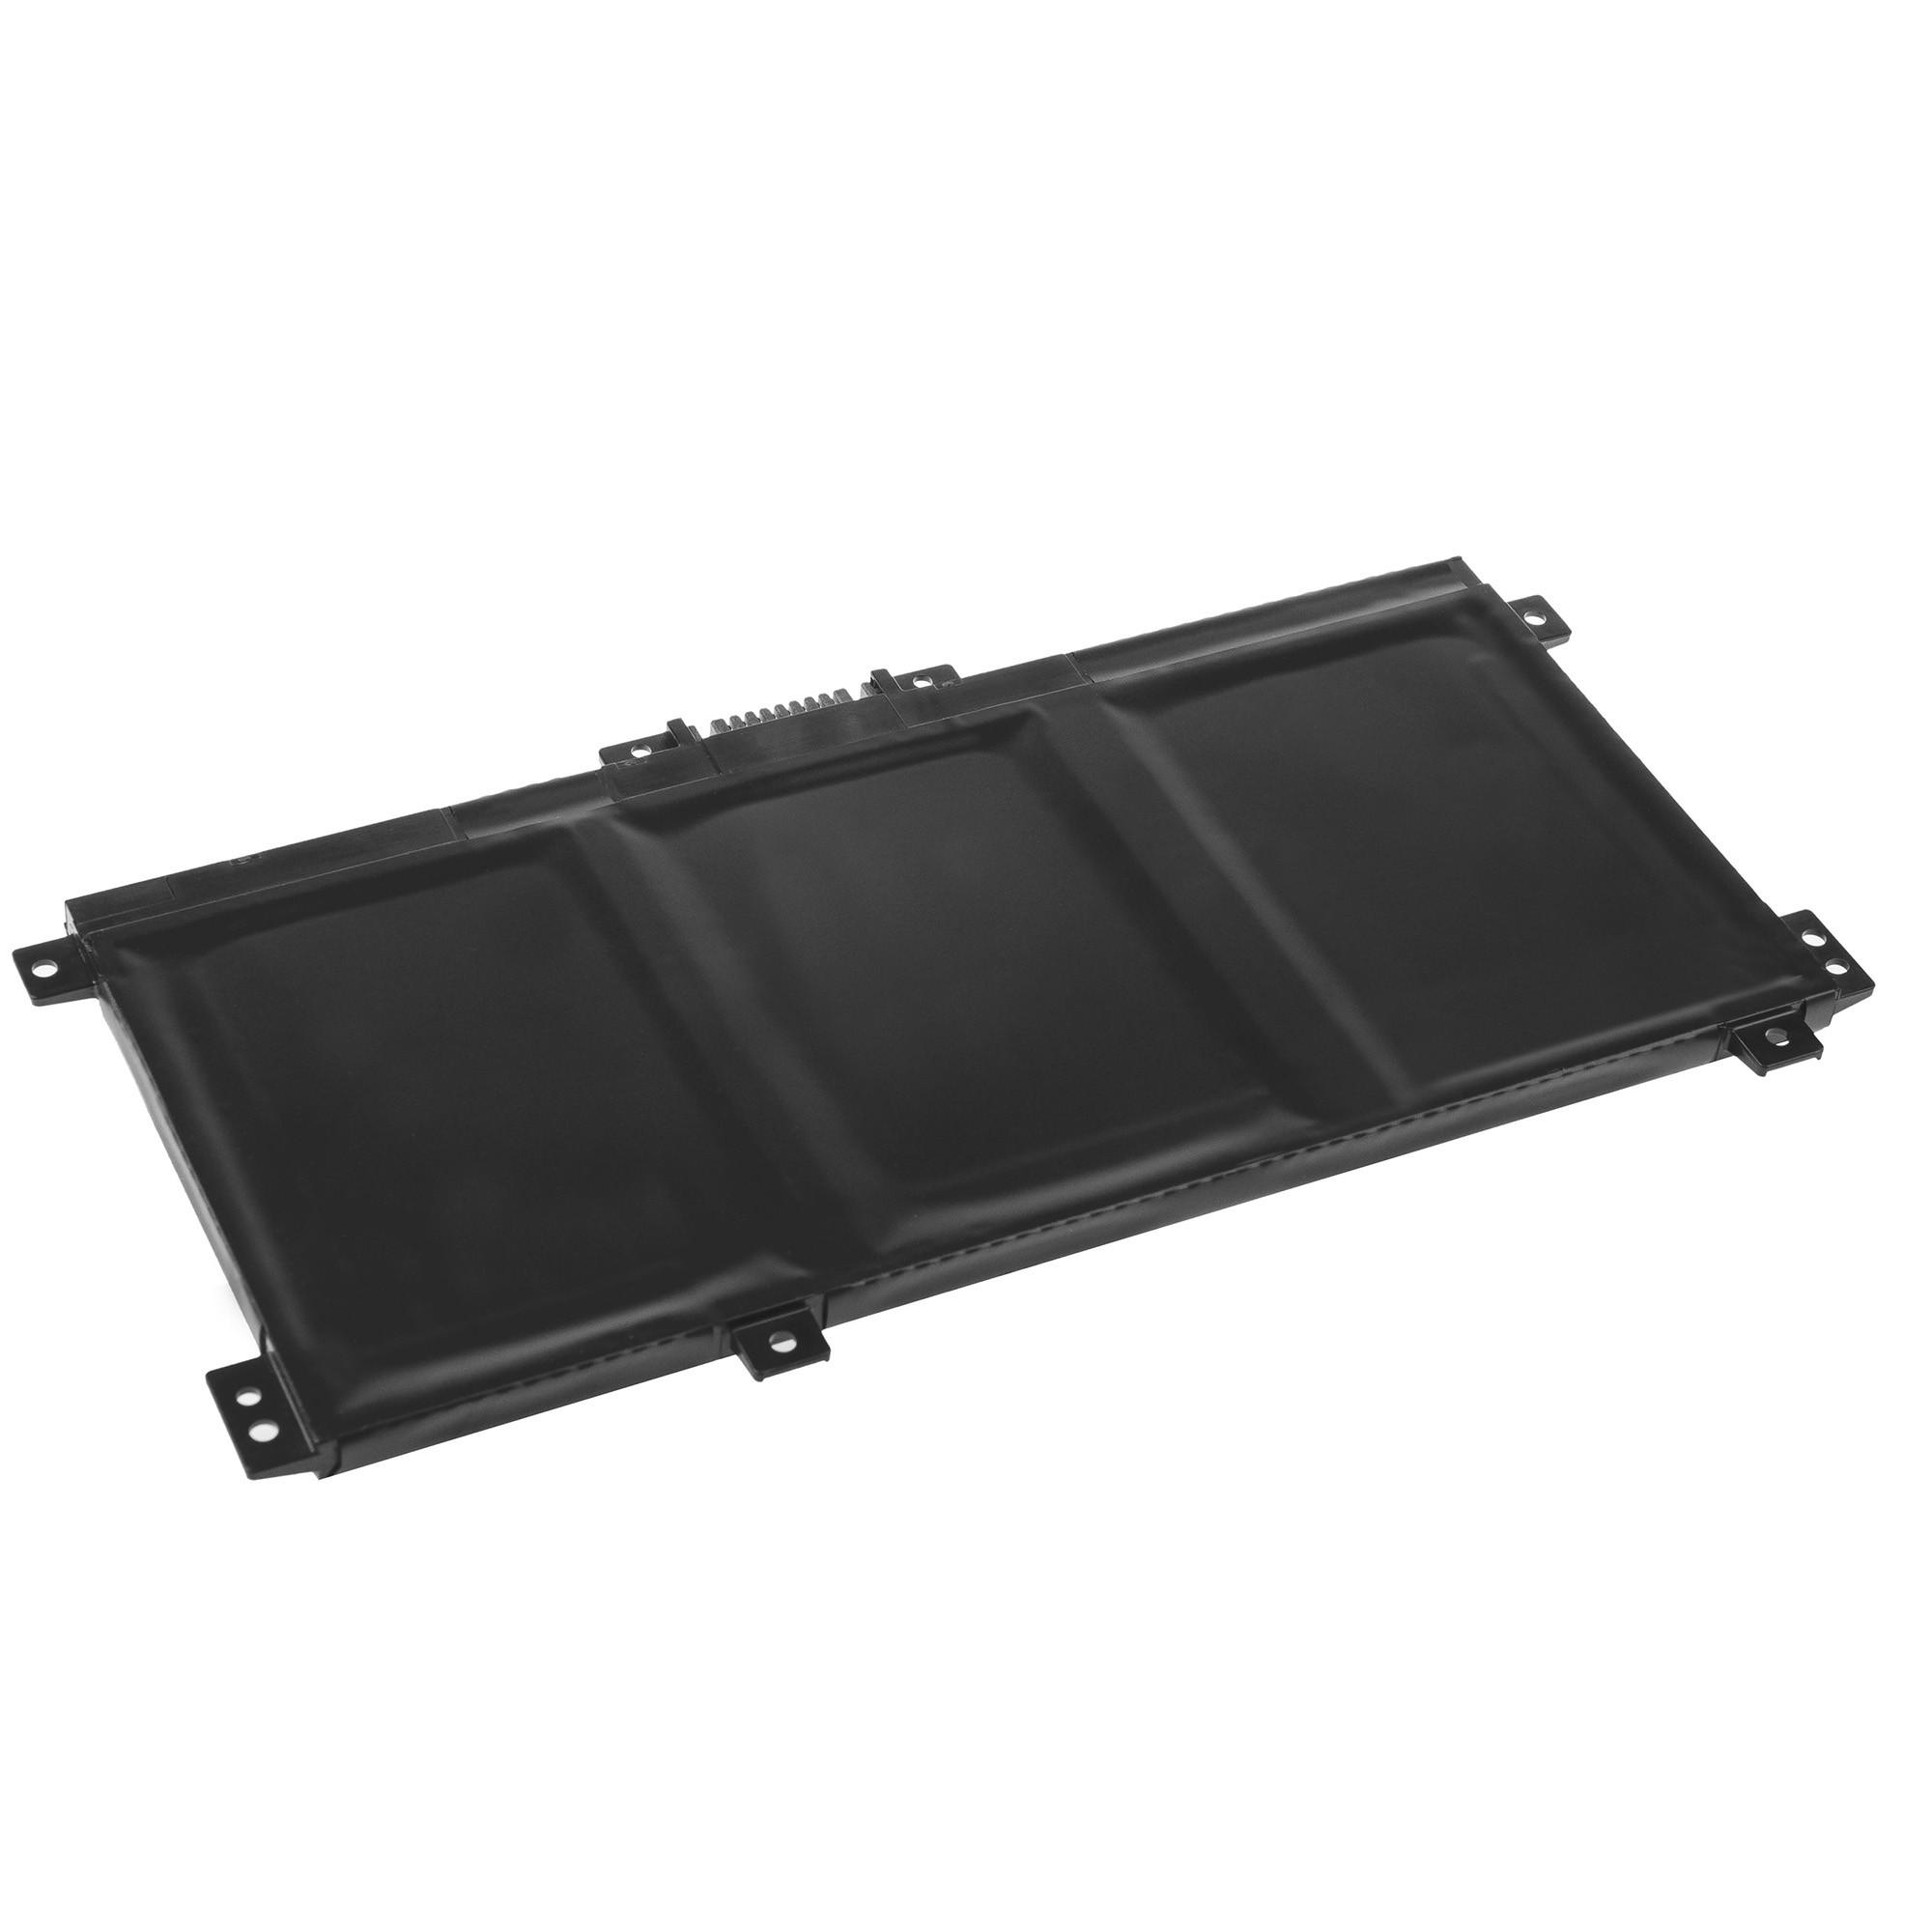 Green Cell Baterie LK03XL pro HP Envy x360 15-BP 15-BP000NW 15-BP001NW 15-BP002NW 15-BP100NW 15-BP101NW 15-CN 17-AE 17-BW